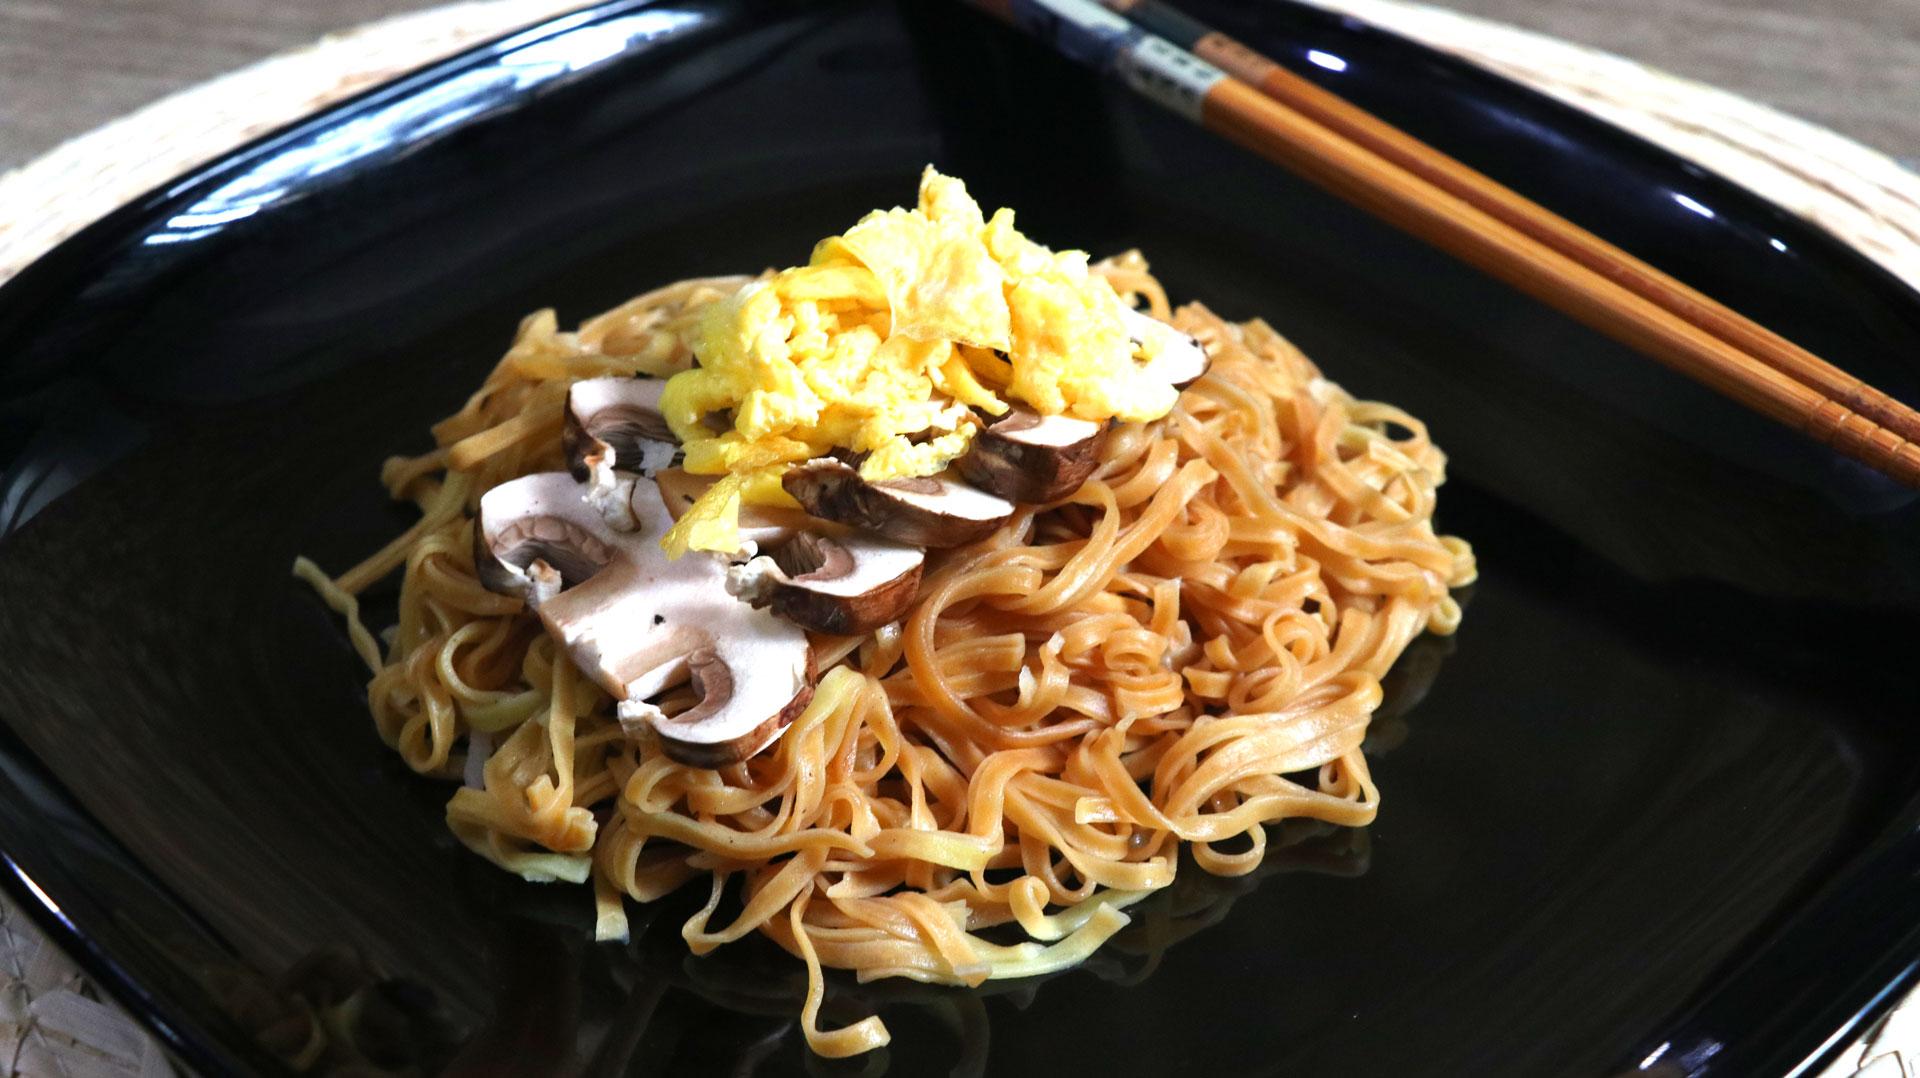 two-bad-chefs-mushroom-noodles-dish-03.jpg